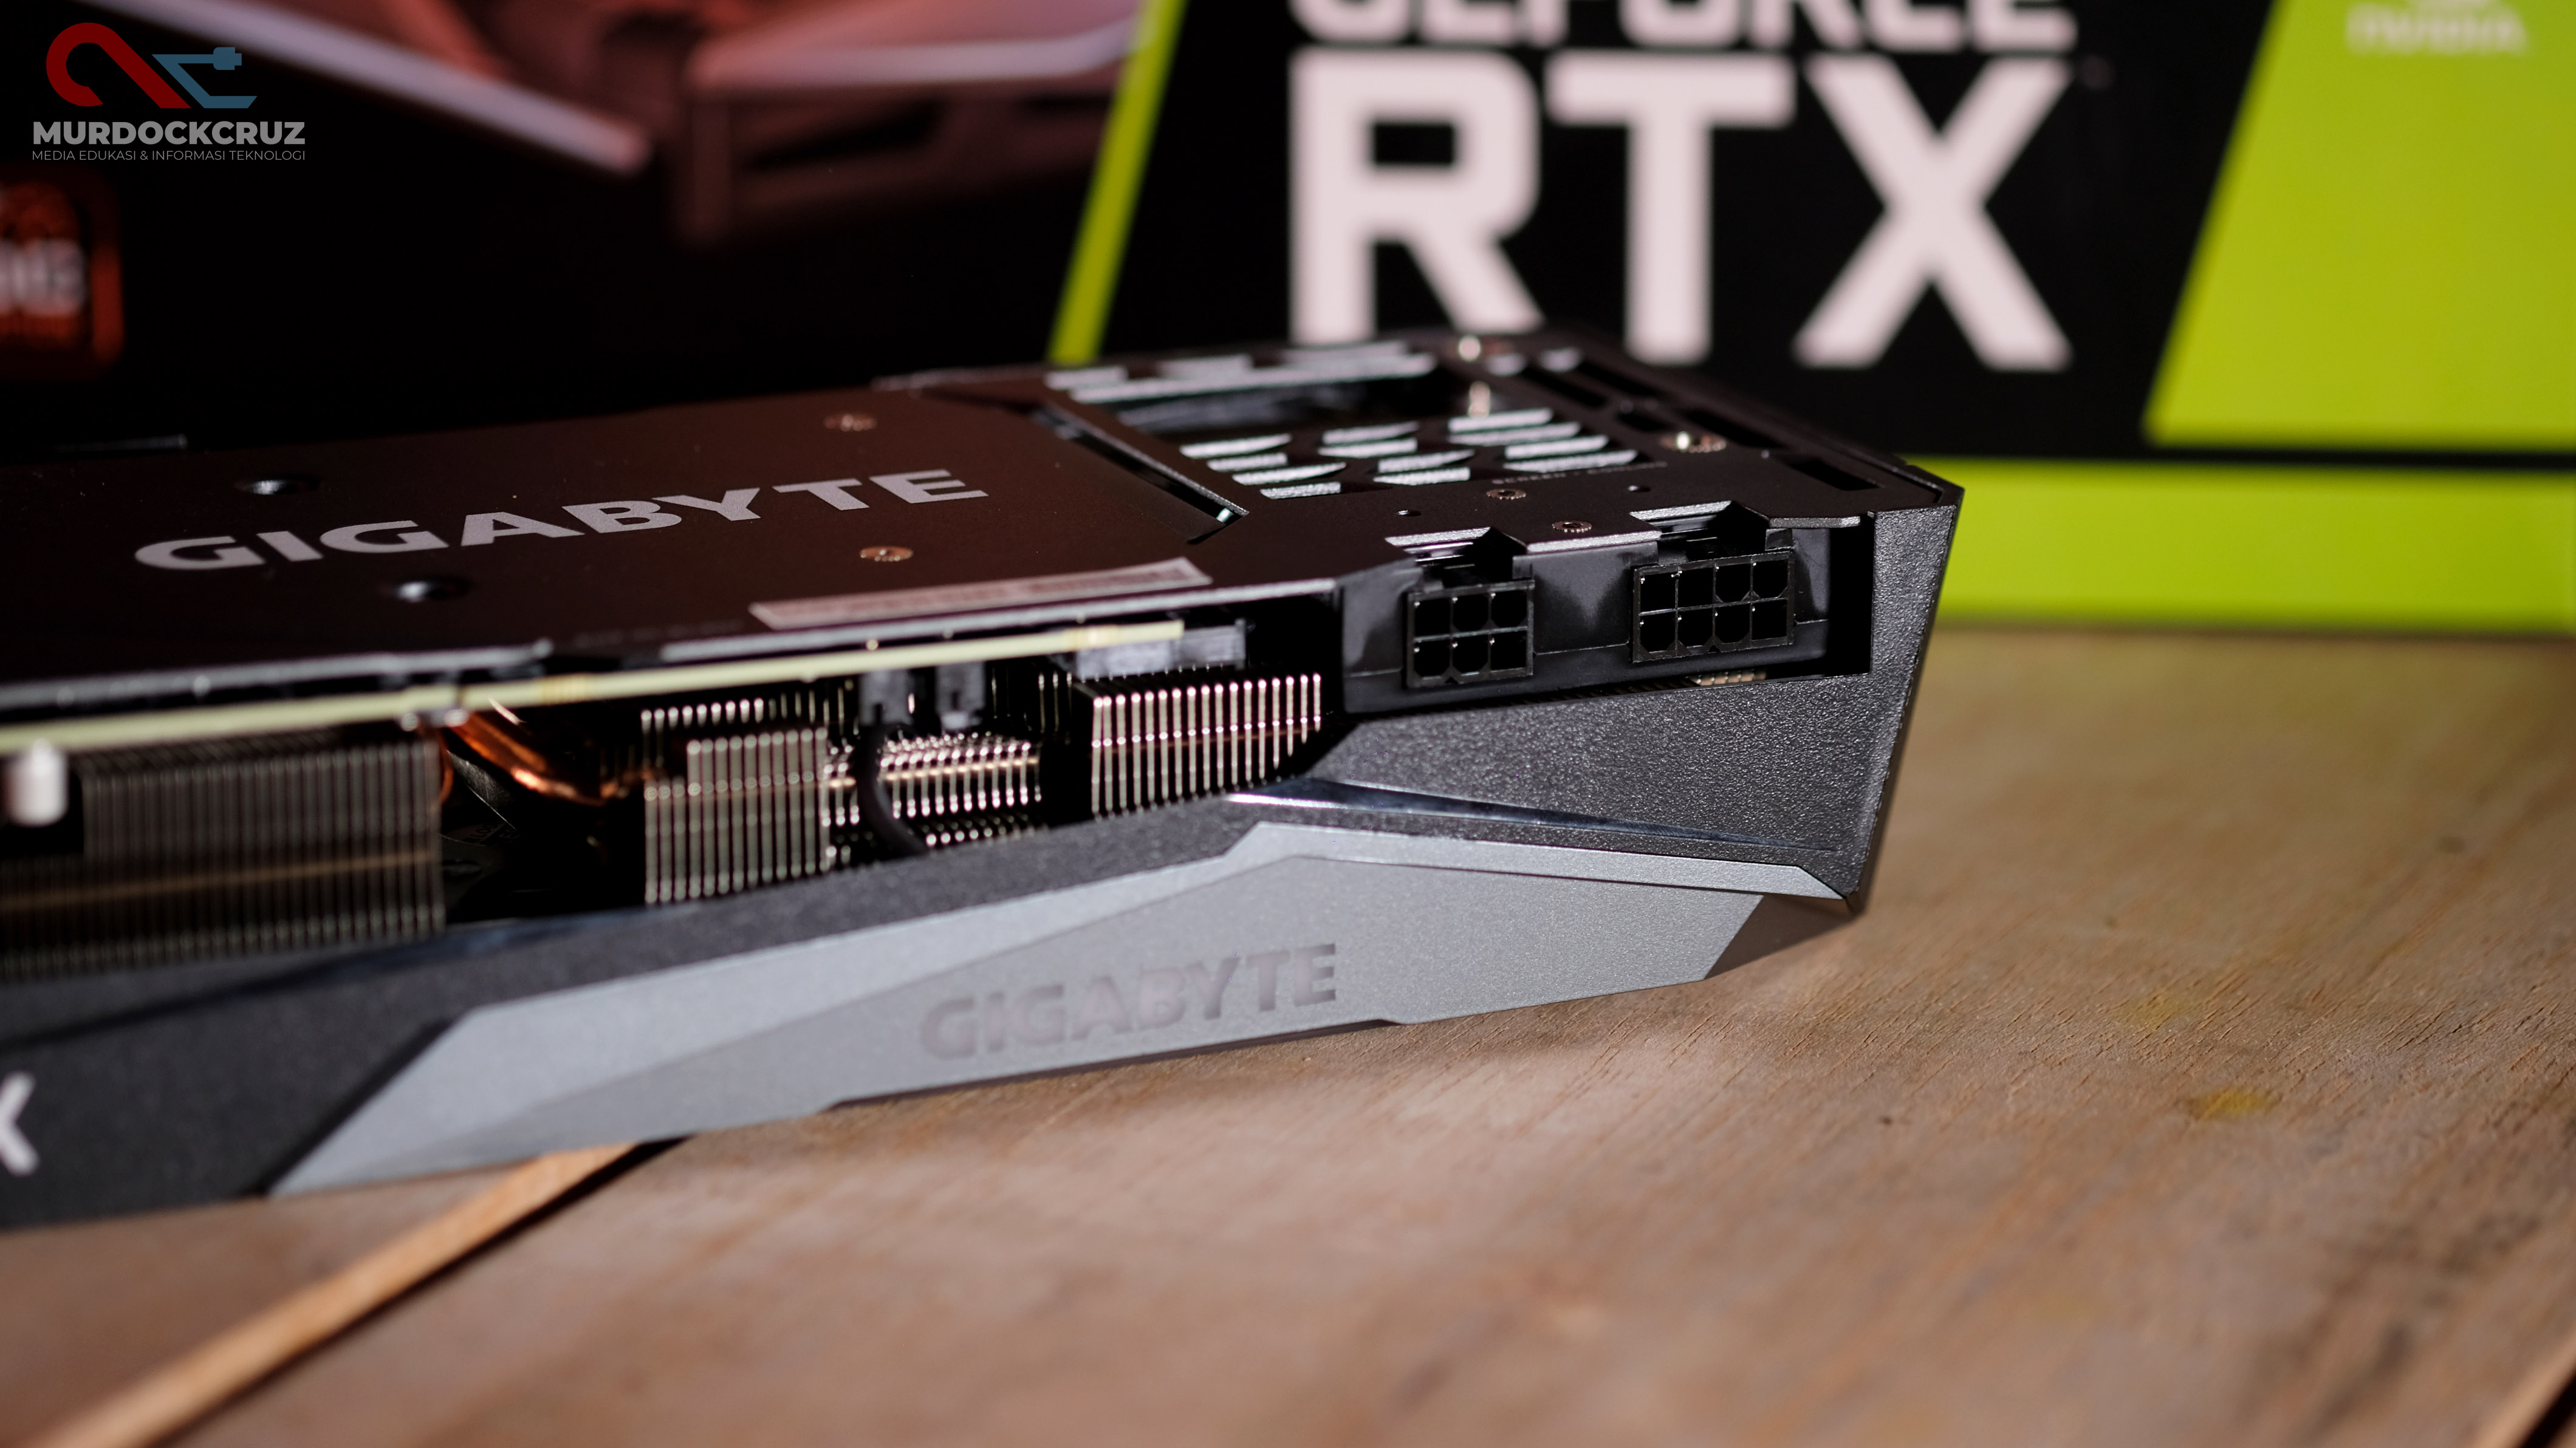 Gigabyte GeForce RTX 3060 Ti Gaming OC Pro 8G